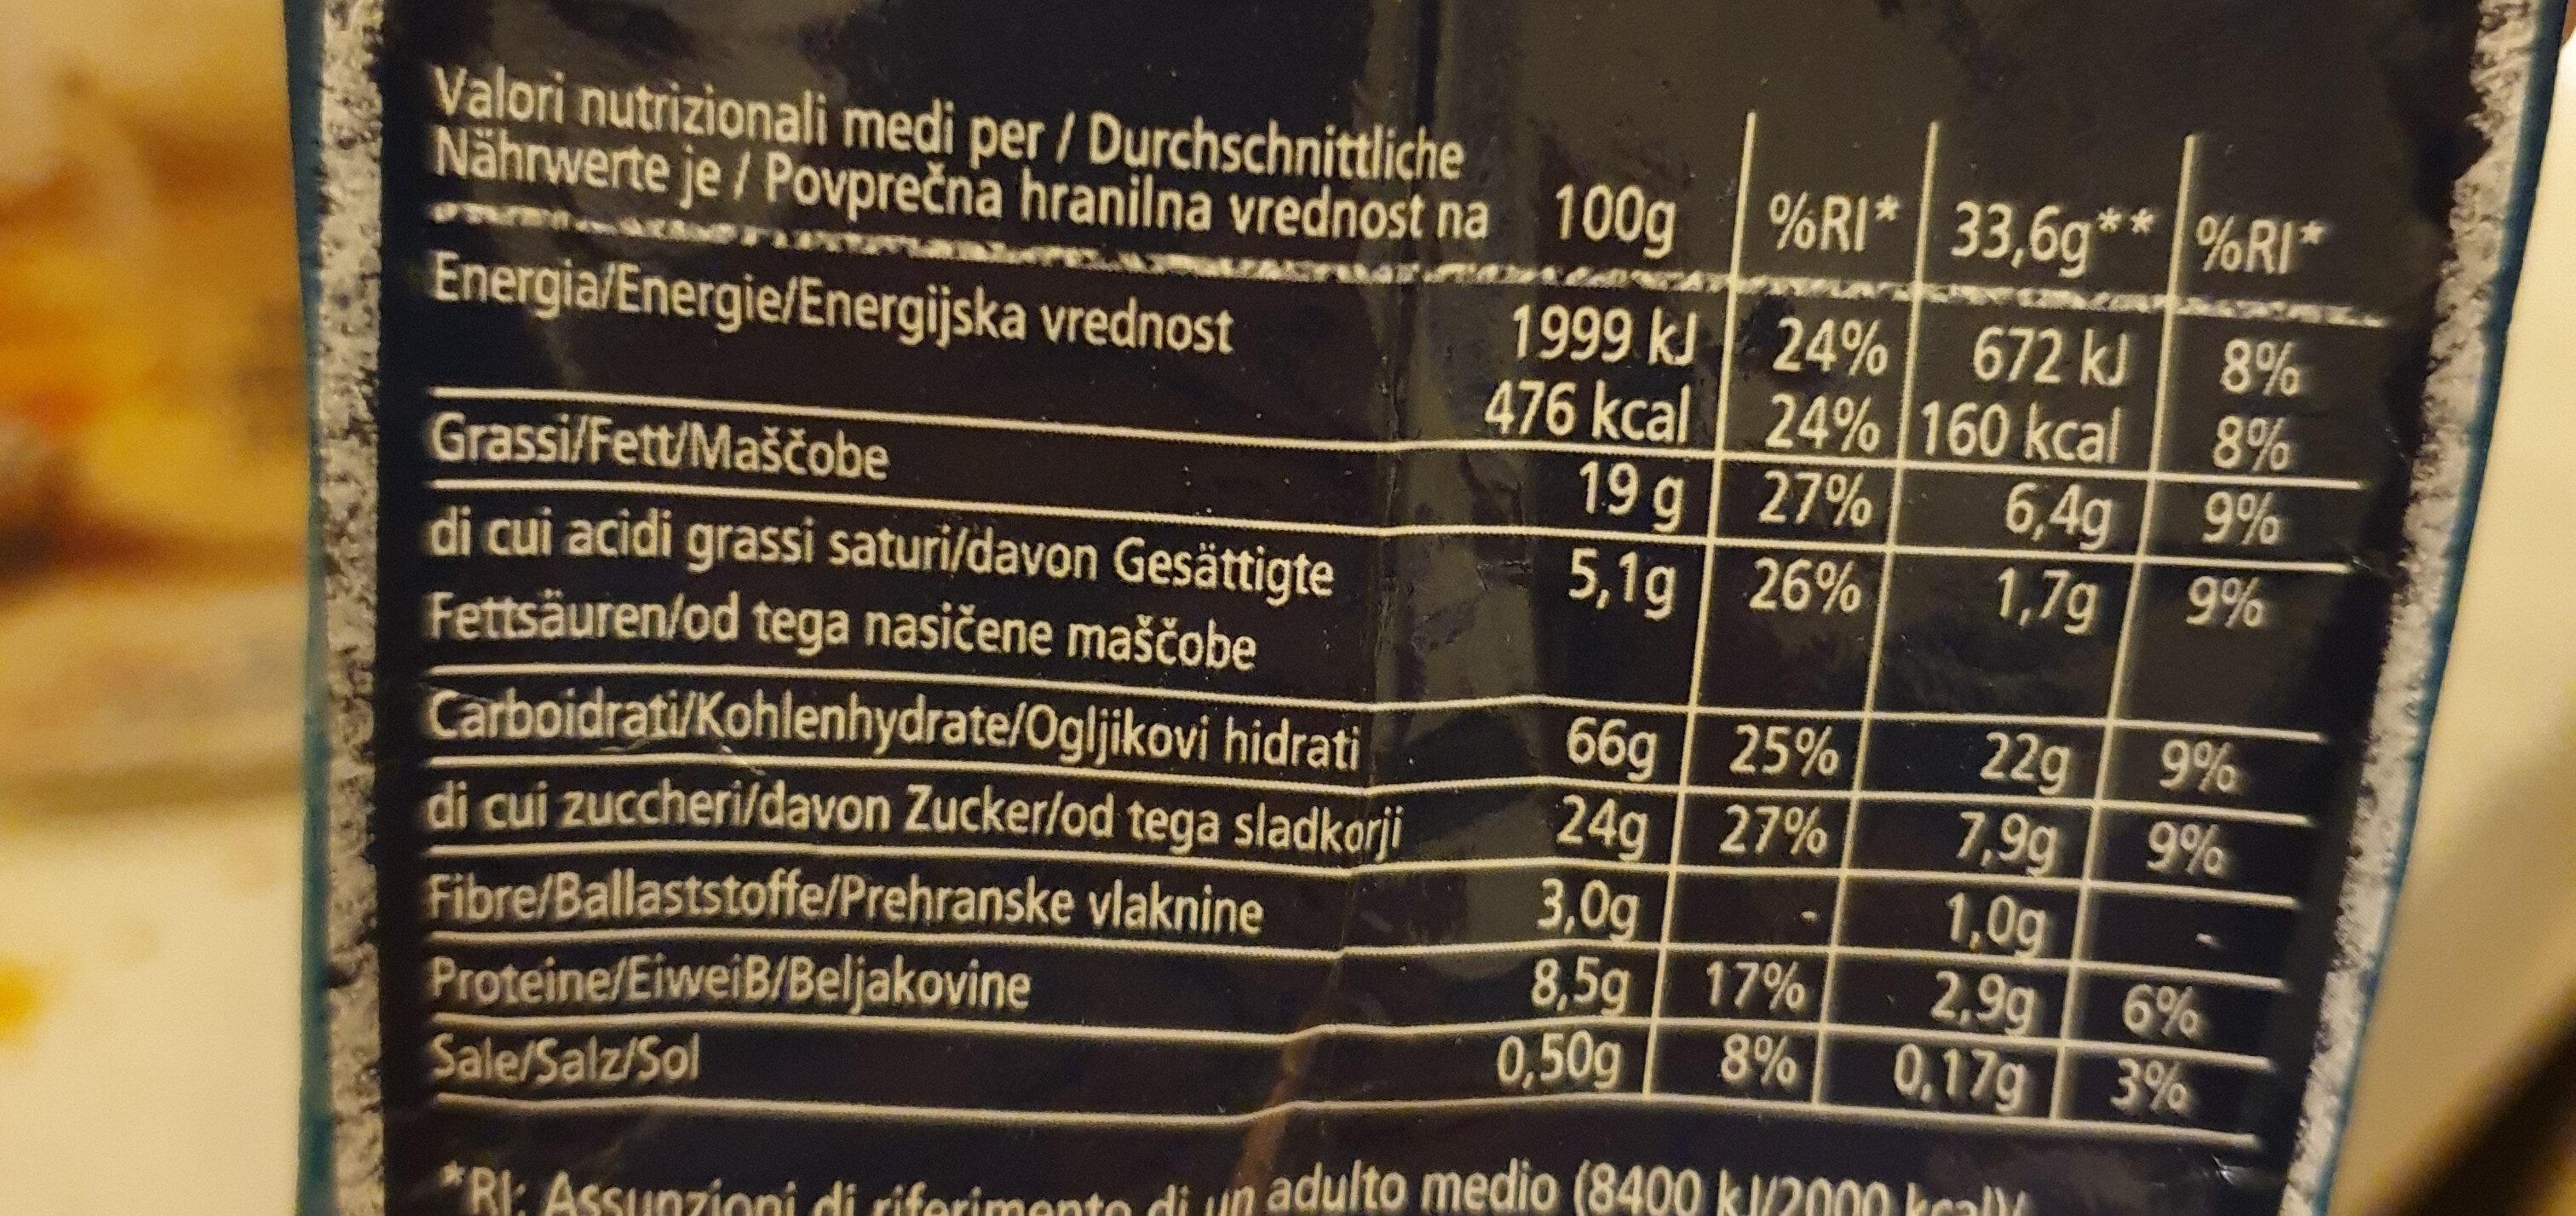 Frollini contre cacao e nucciole - Informations nutritionnelles - it